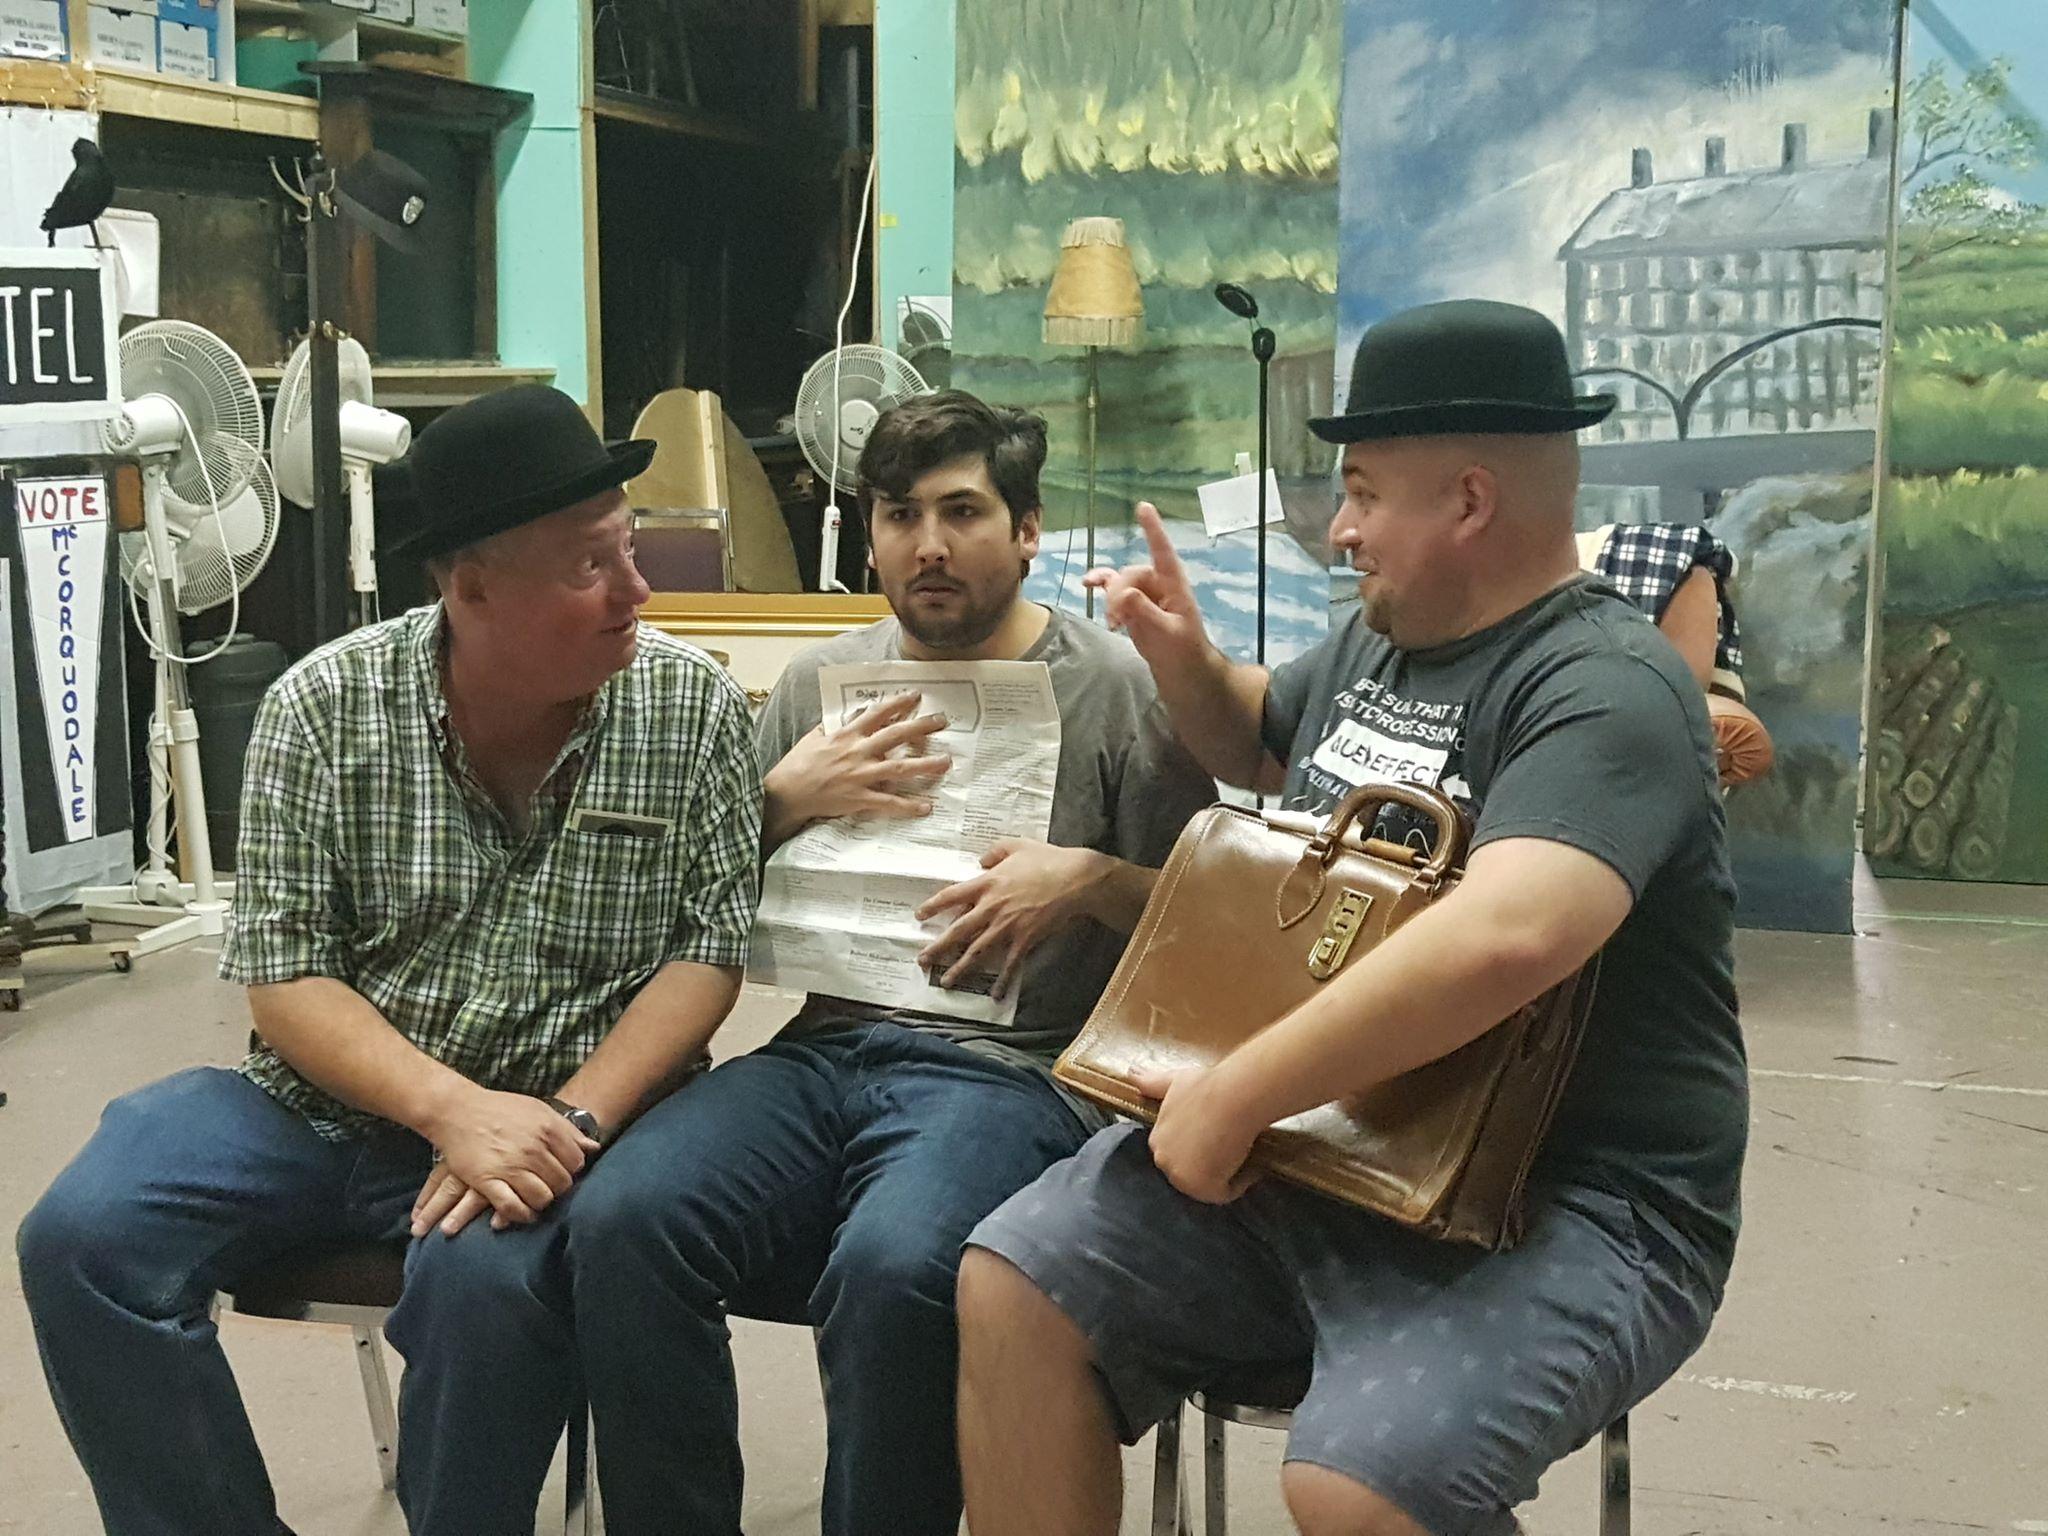 L – R: Tommy Boston as Clown, Rob Magee as Richard Hannay, Paul Bryant as Clown. Photo by Darlene Thomas.